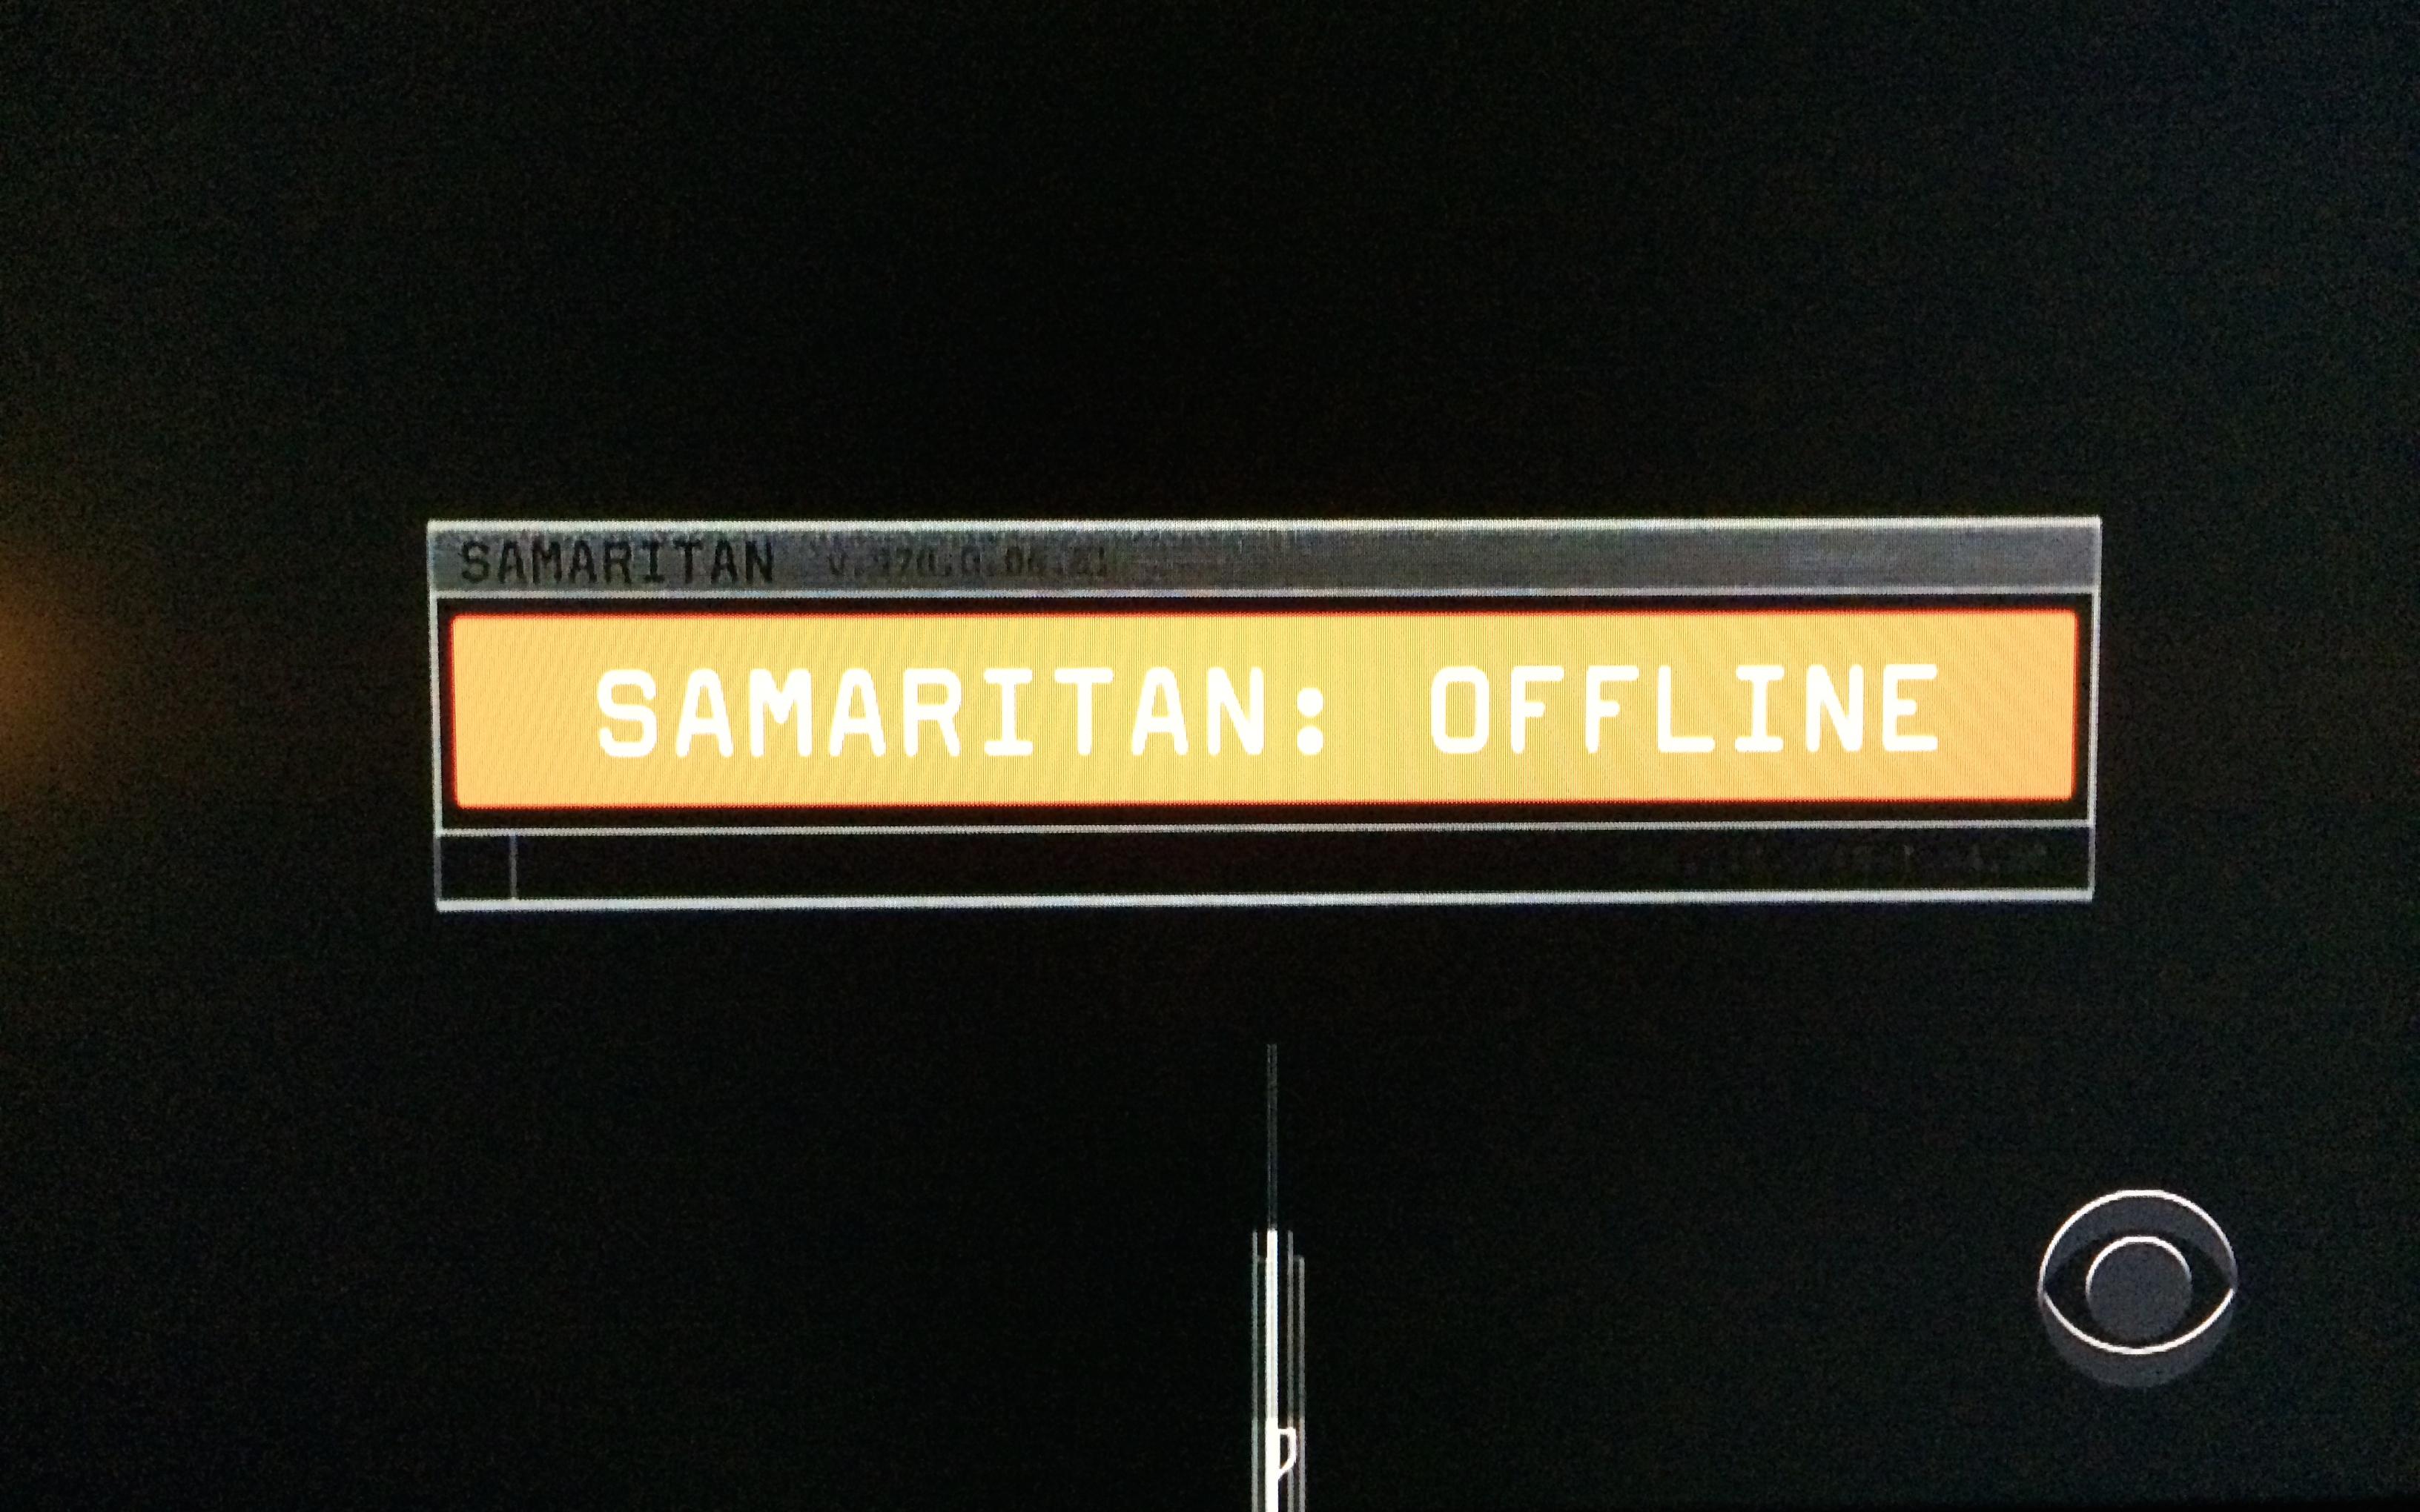 samaritan vs machine